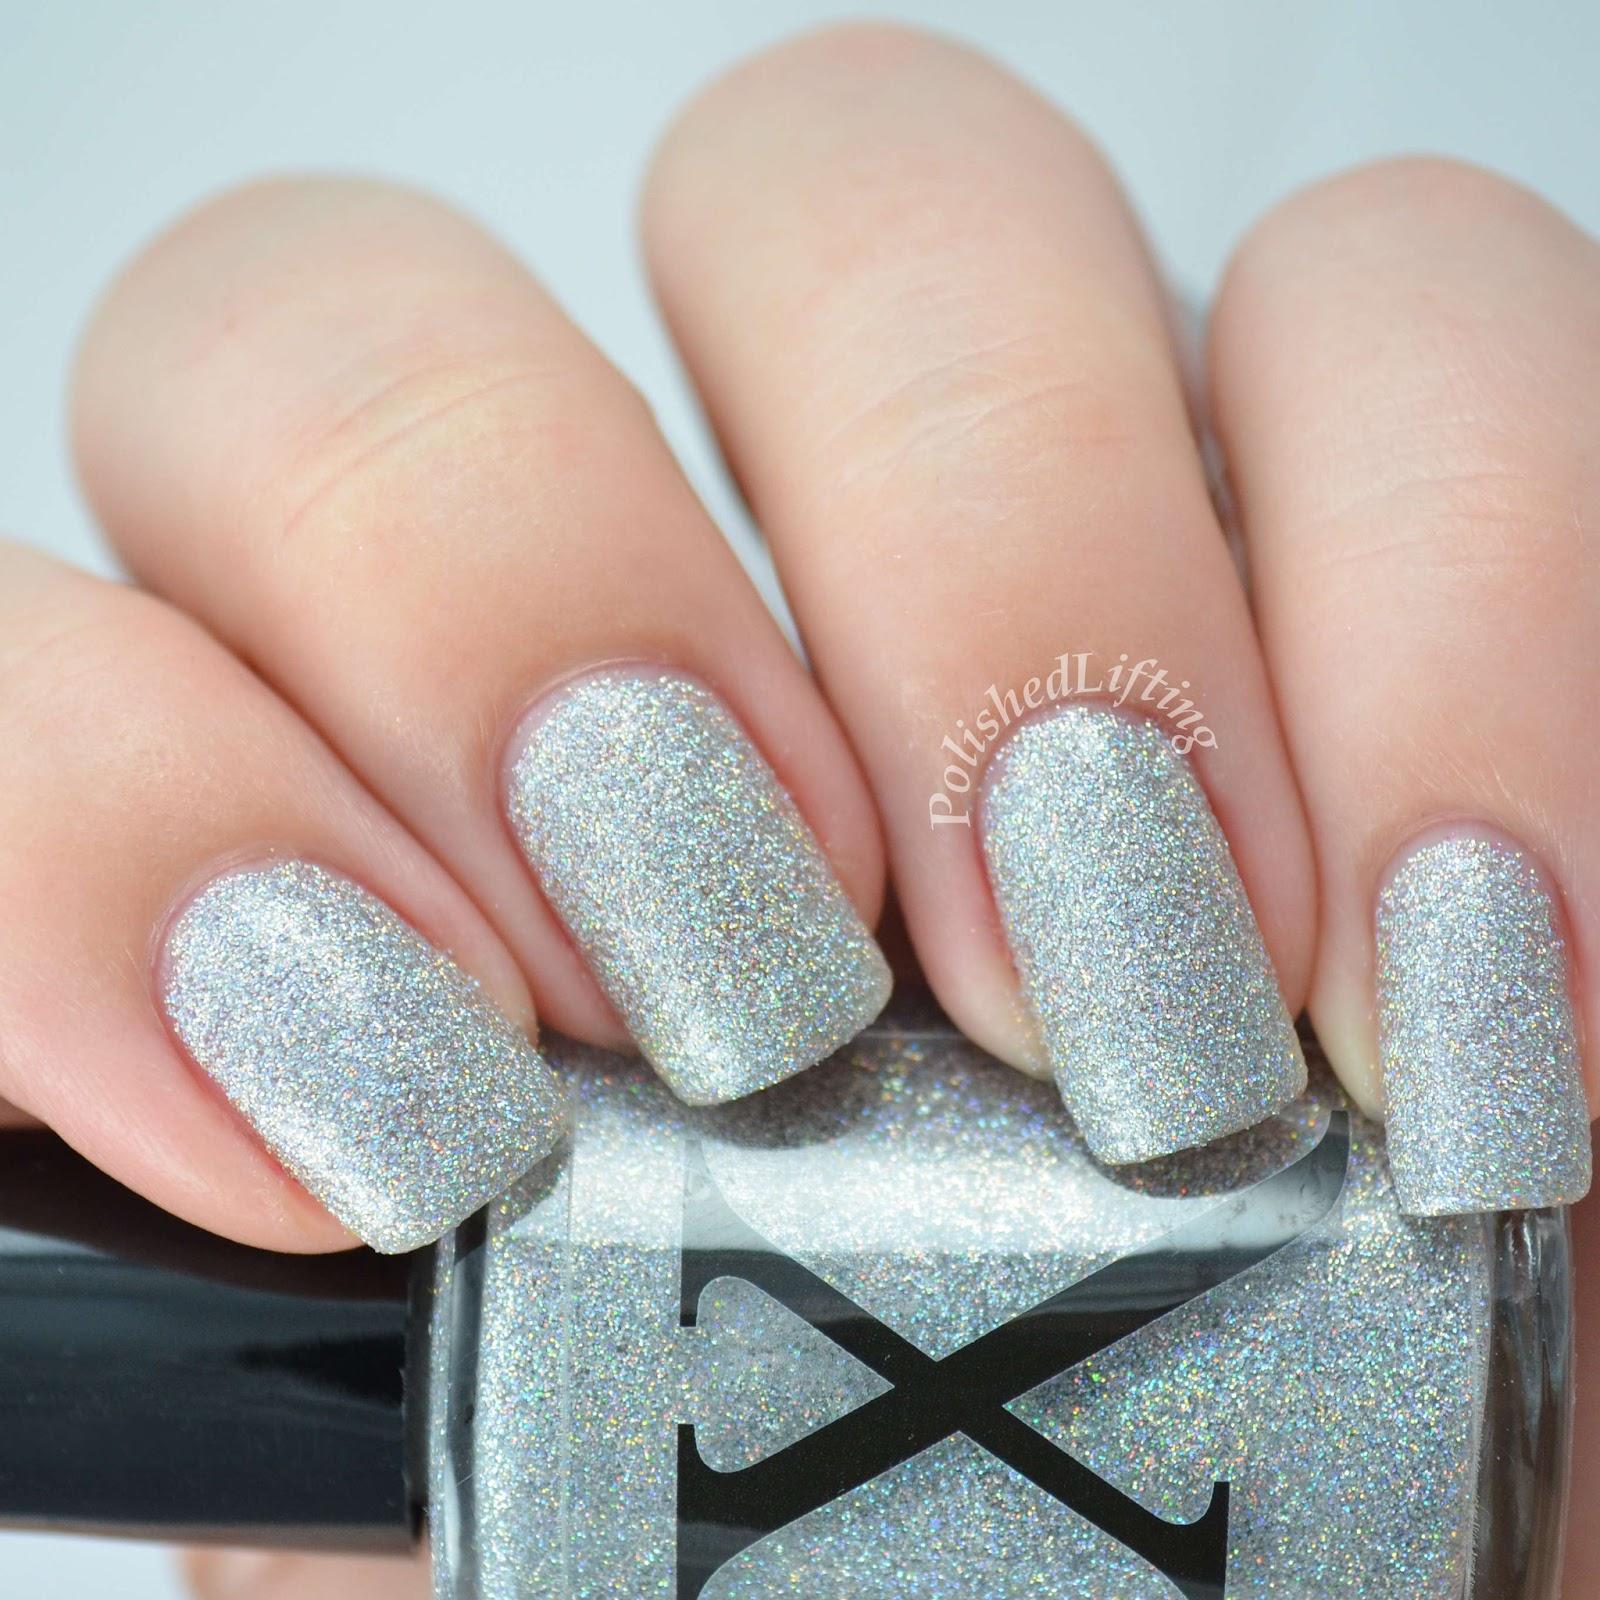 Silver nail polish with glitter